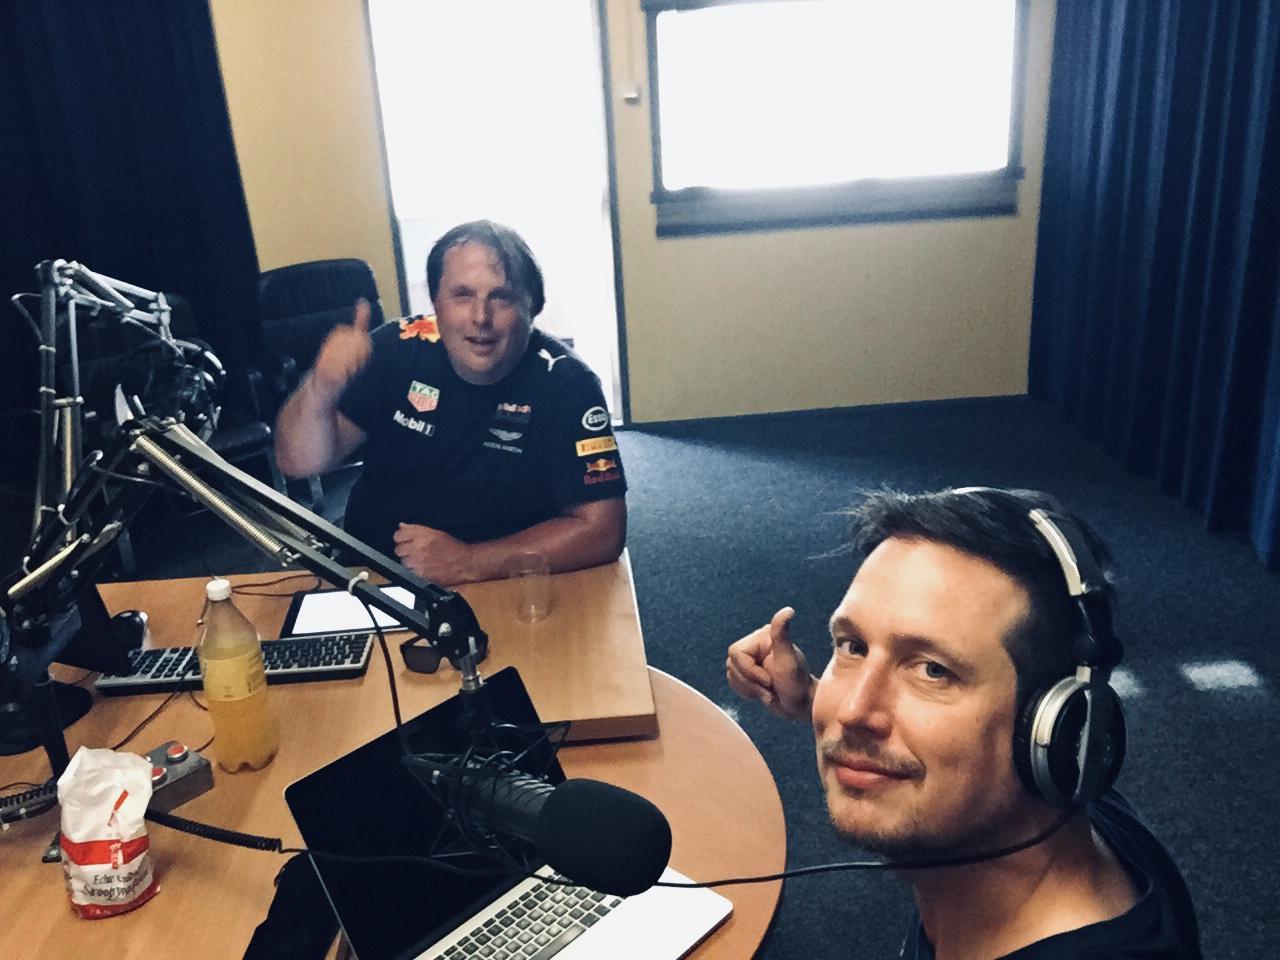 Xzatic – Live At RTW FM, NL